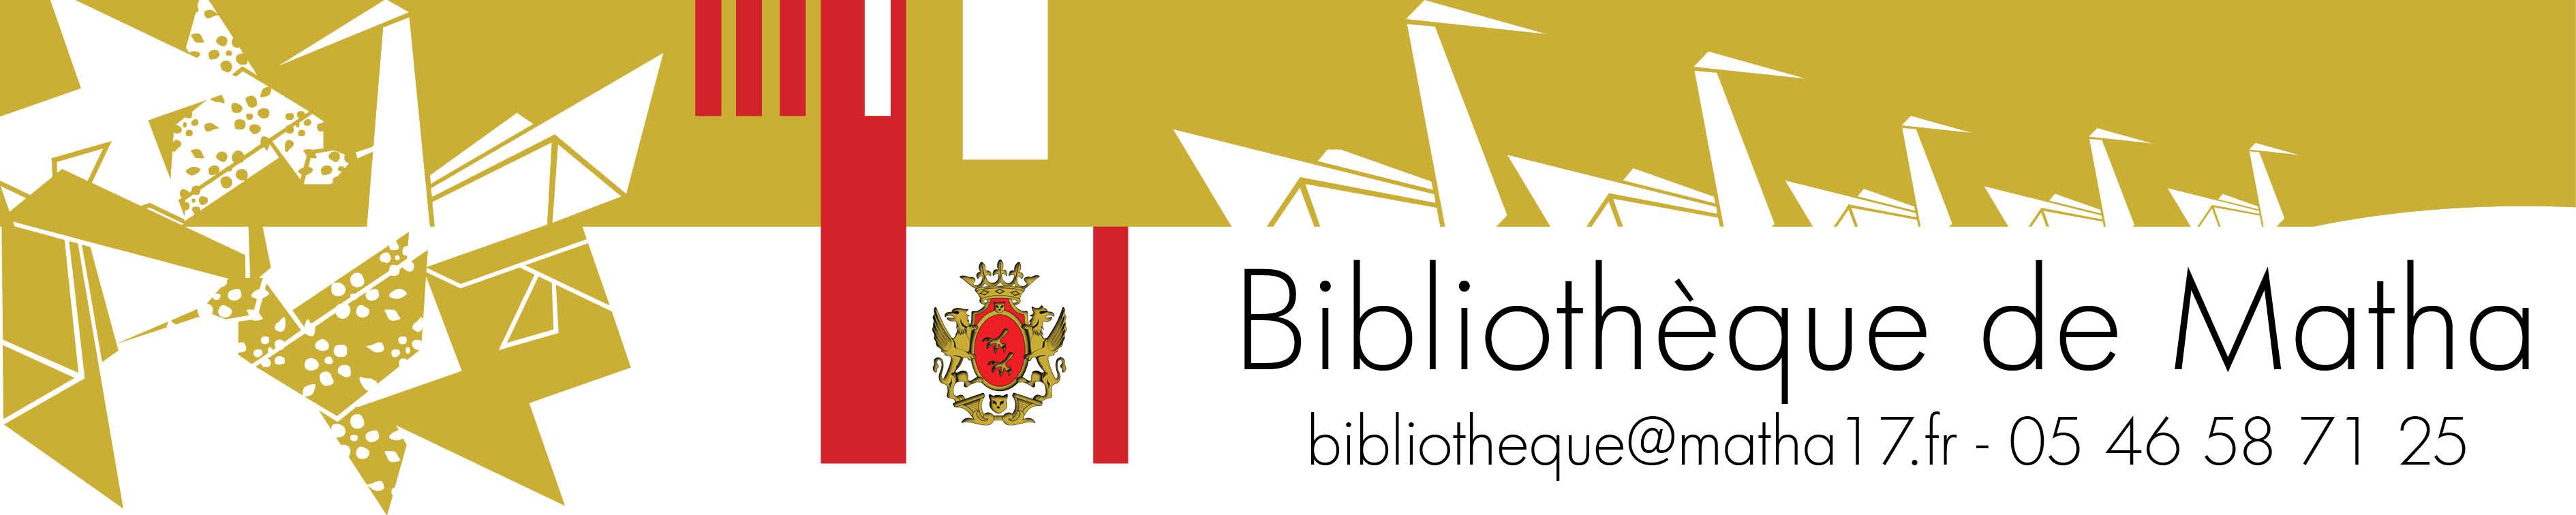 Bibliothèque de Matha